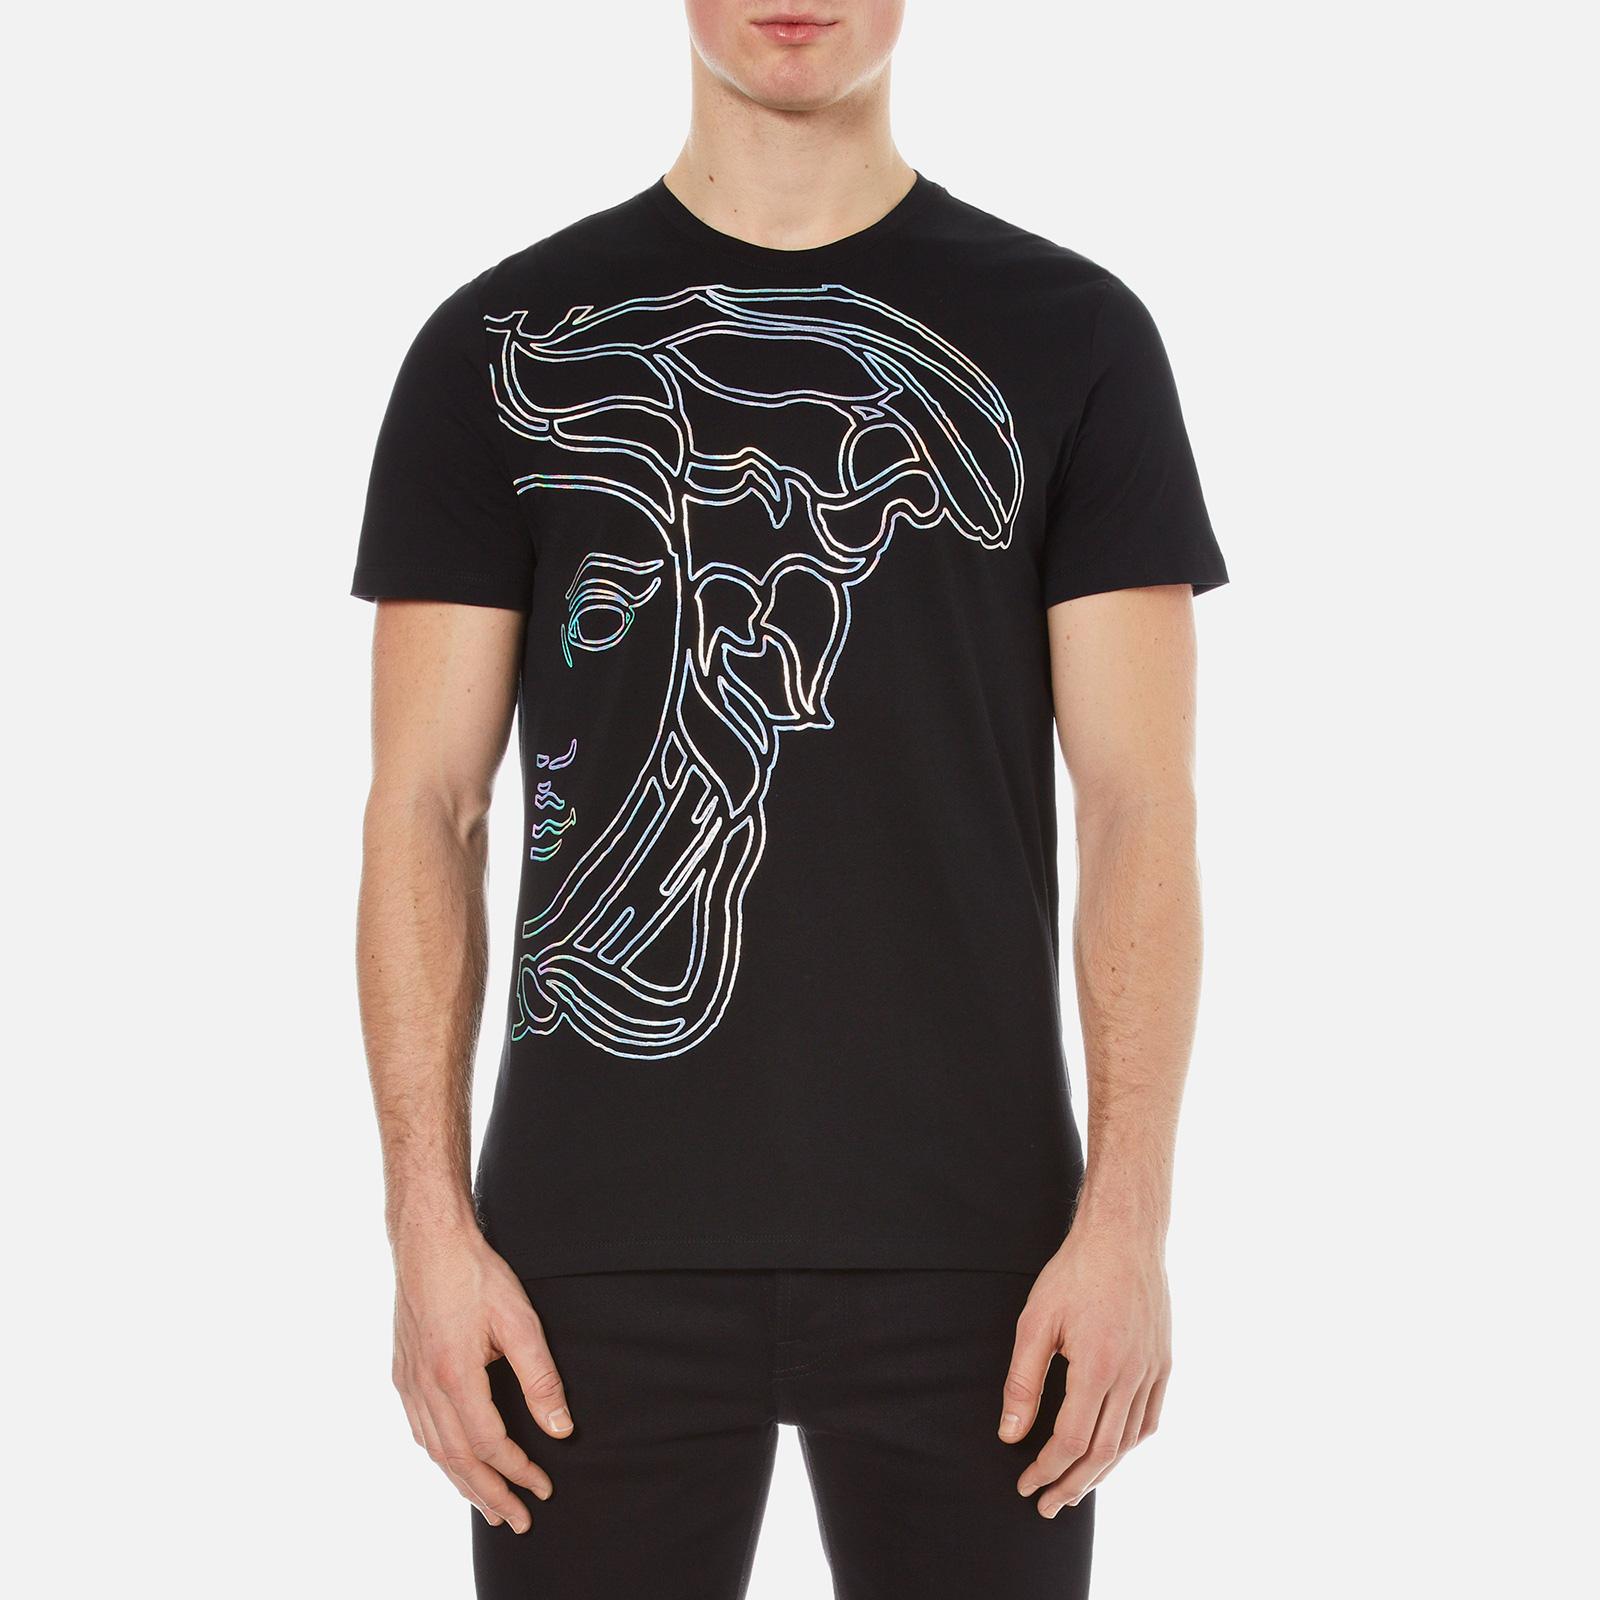 482d3ad4f Versace Collection Men's Large Medusa Logo T-Shirt - Black - Free UK  Delivery over £50